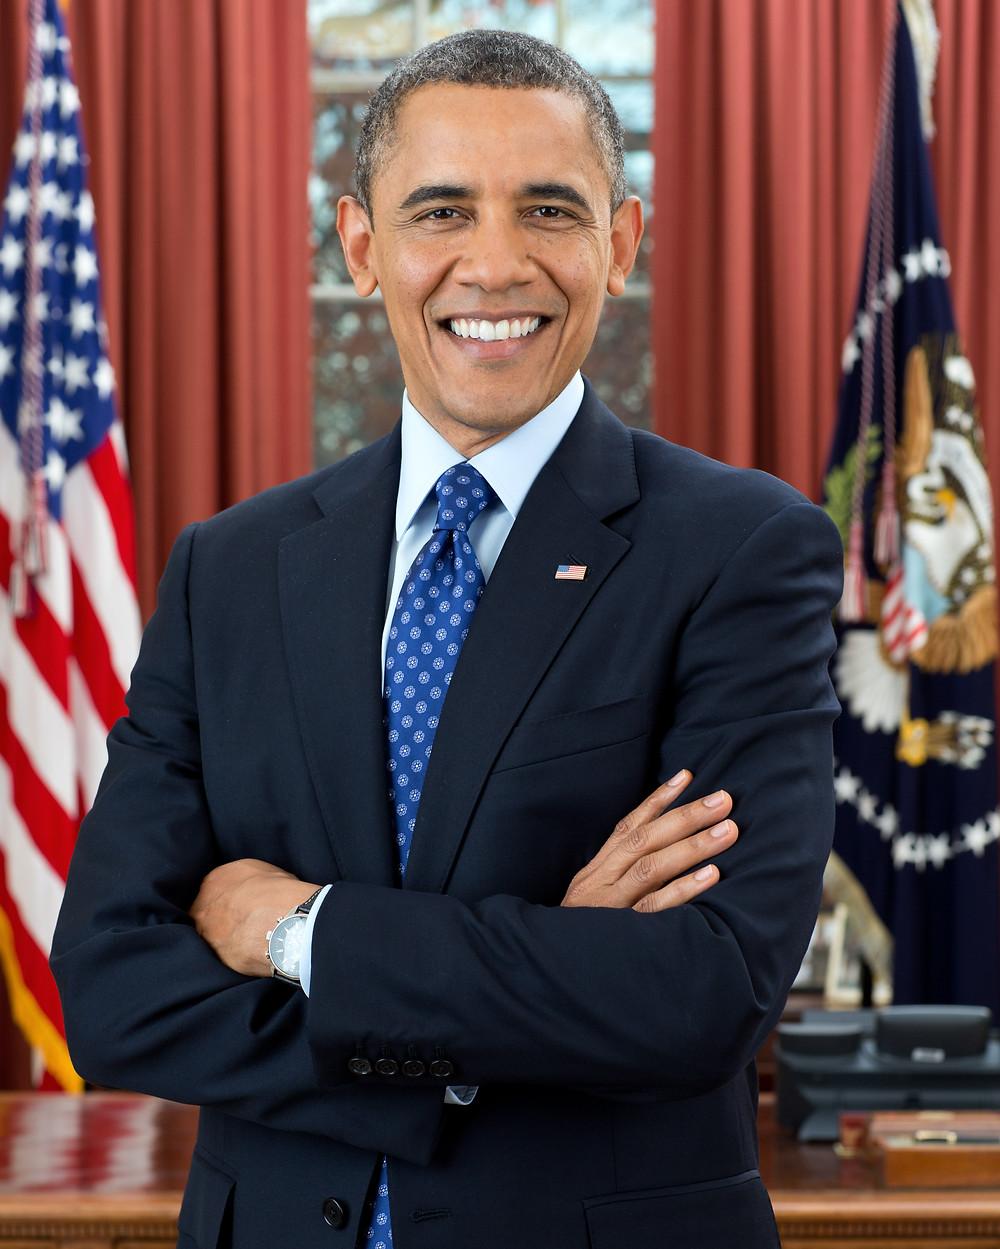 Portrait of President Barack Obama